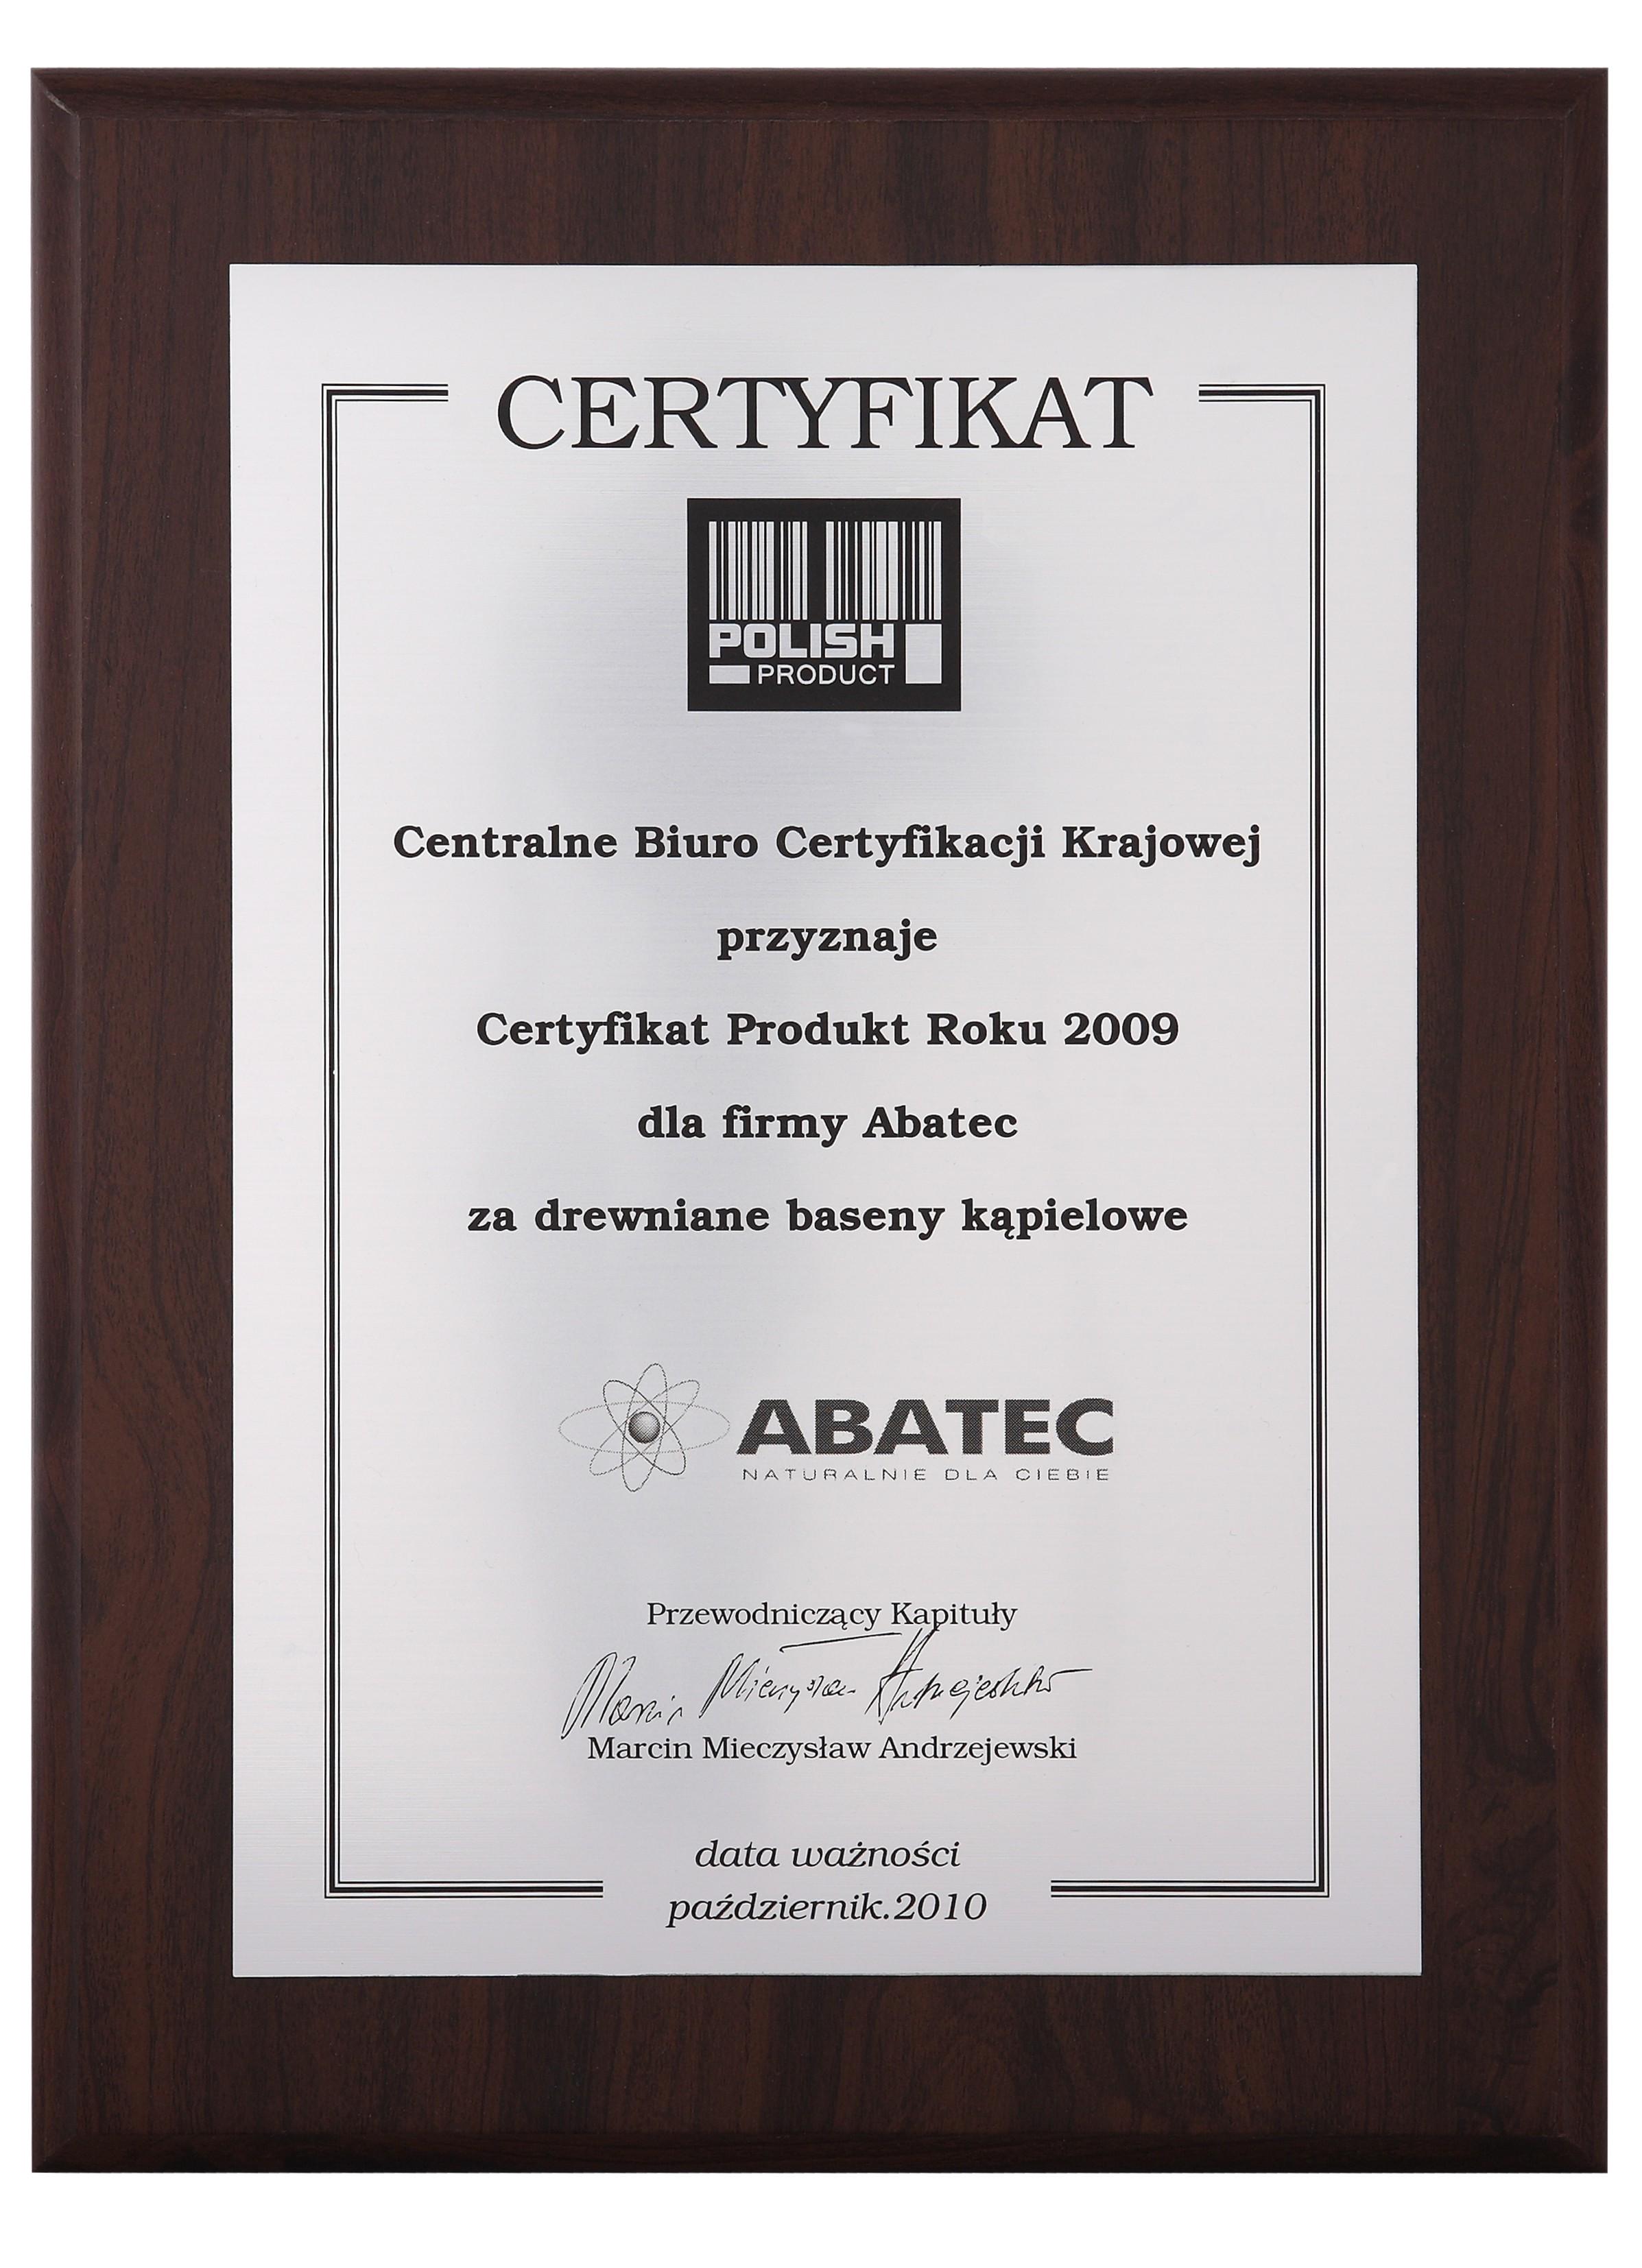 abatec certyfikat polish product 2009